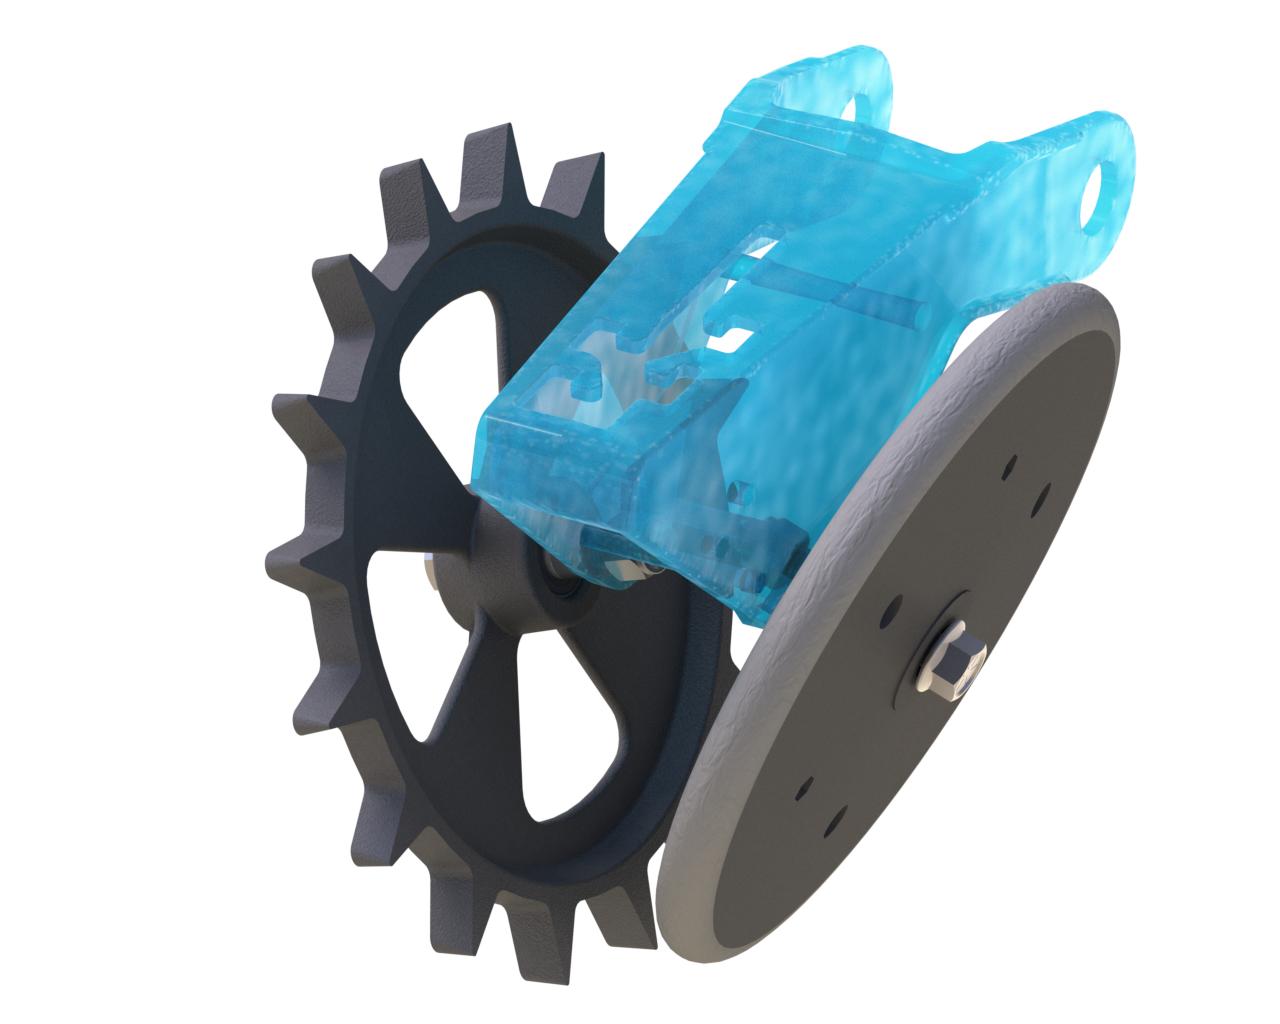 fCrusher Closing Wheel, Rubber factory wheel